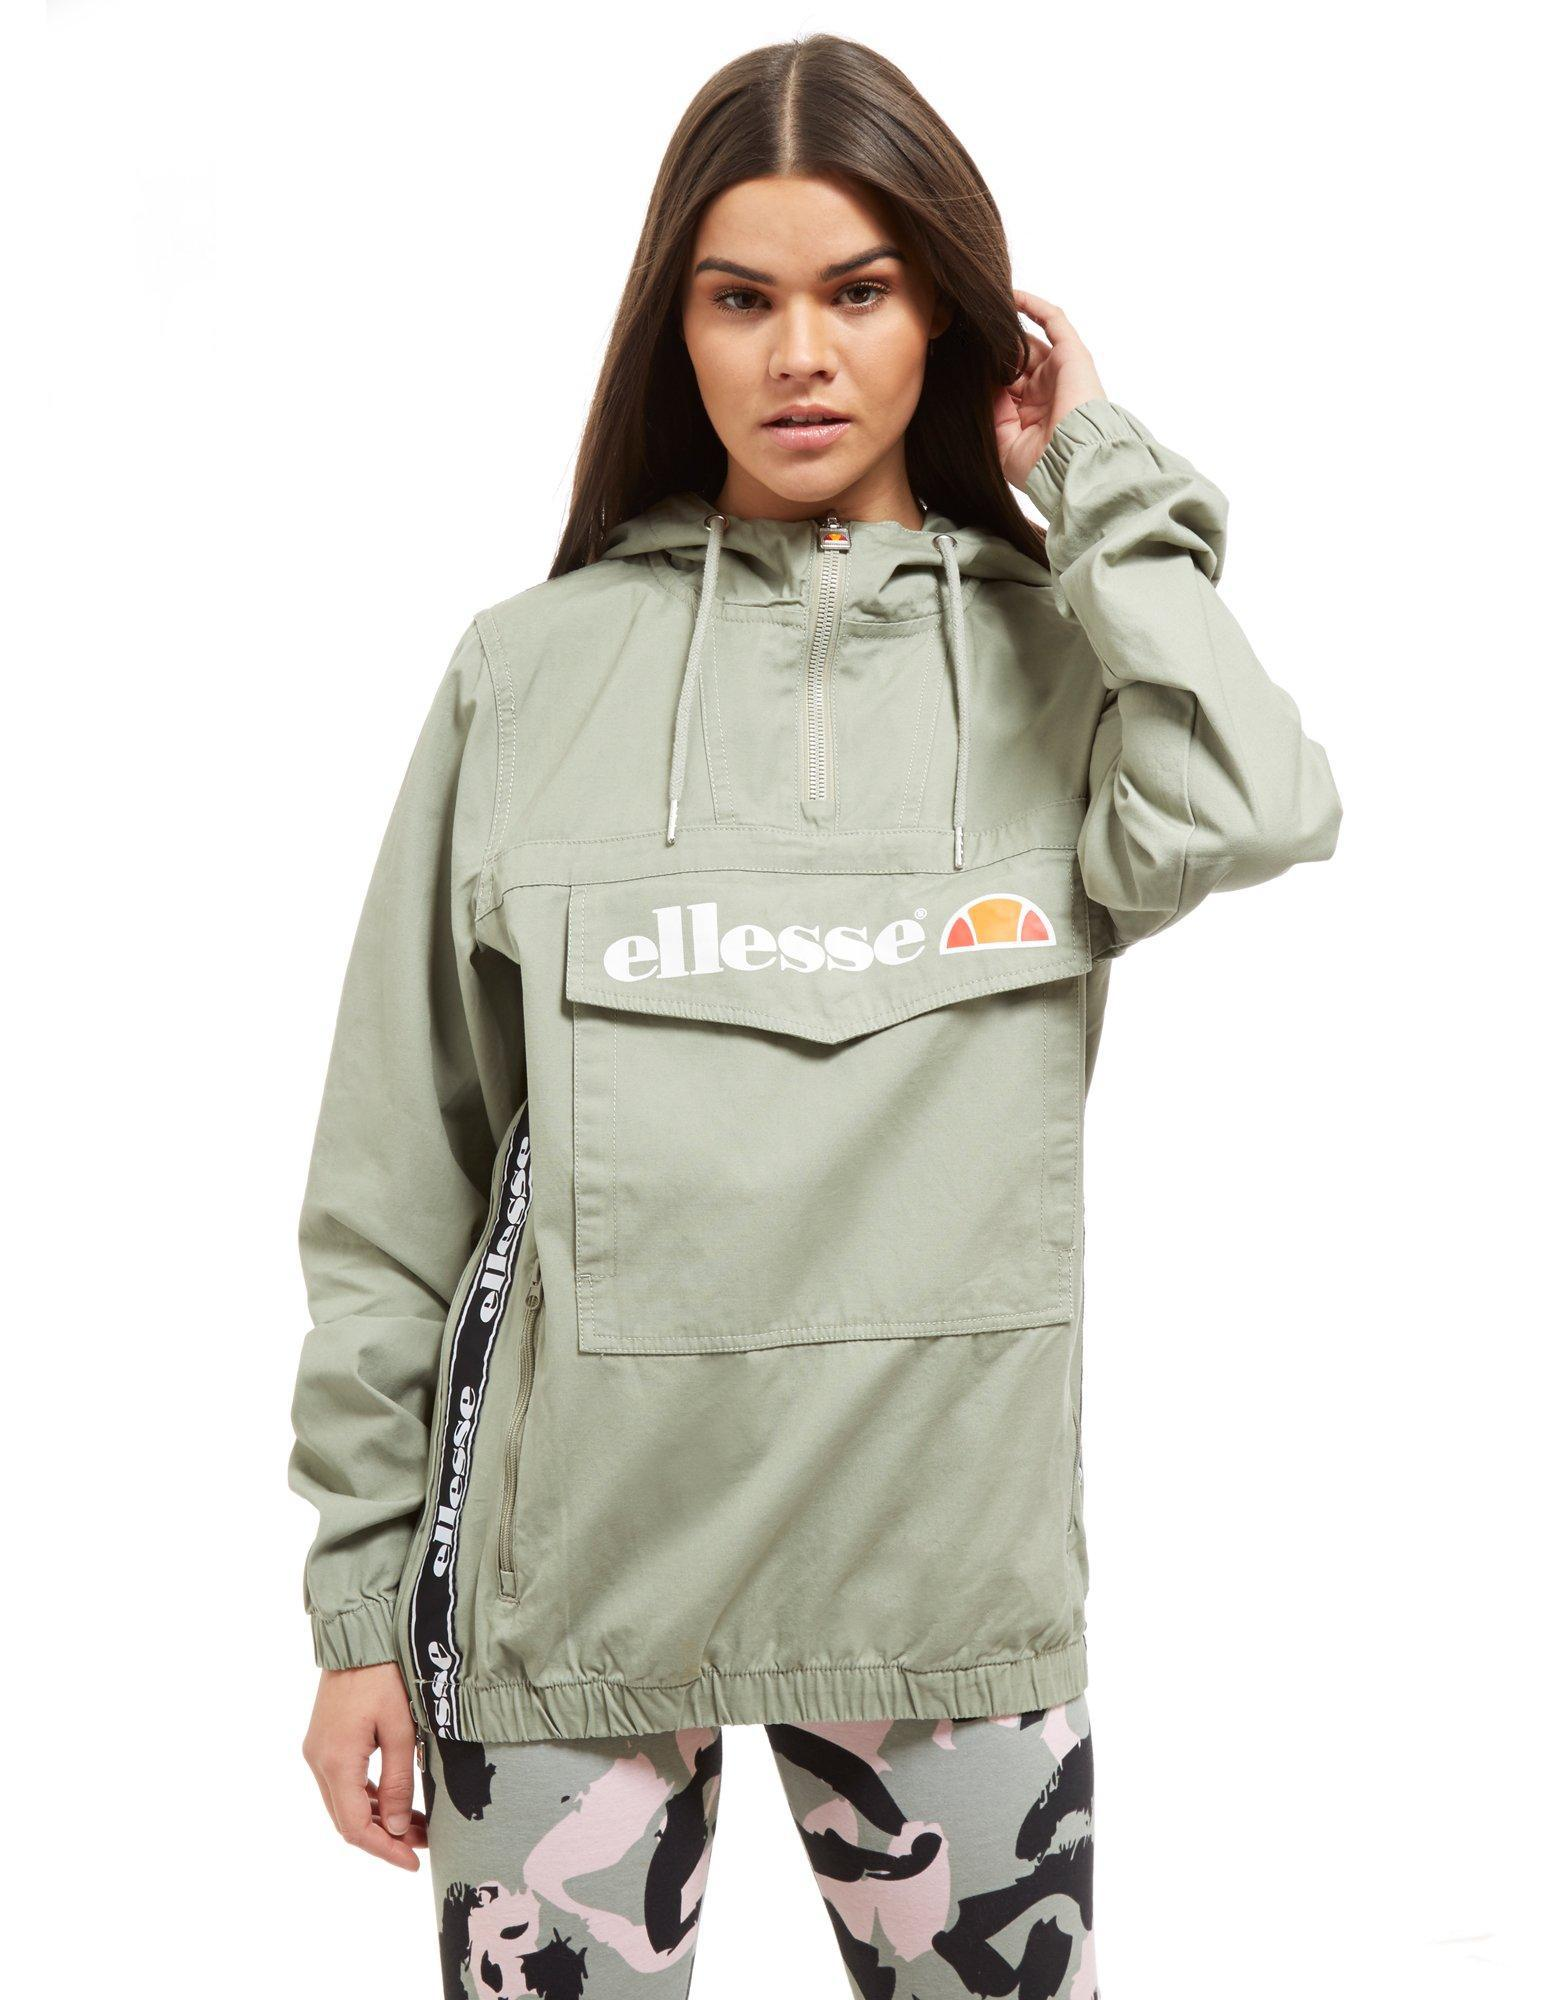 6eb9cb86 Ellesse Multicolor Tape 1/4 Zip Hooded Jacket